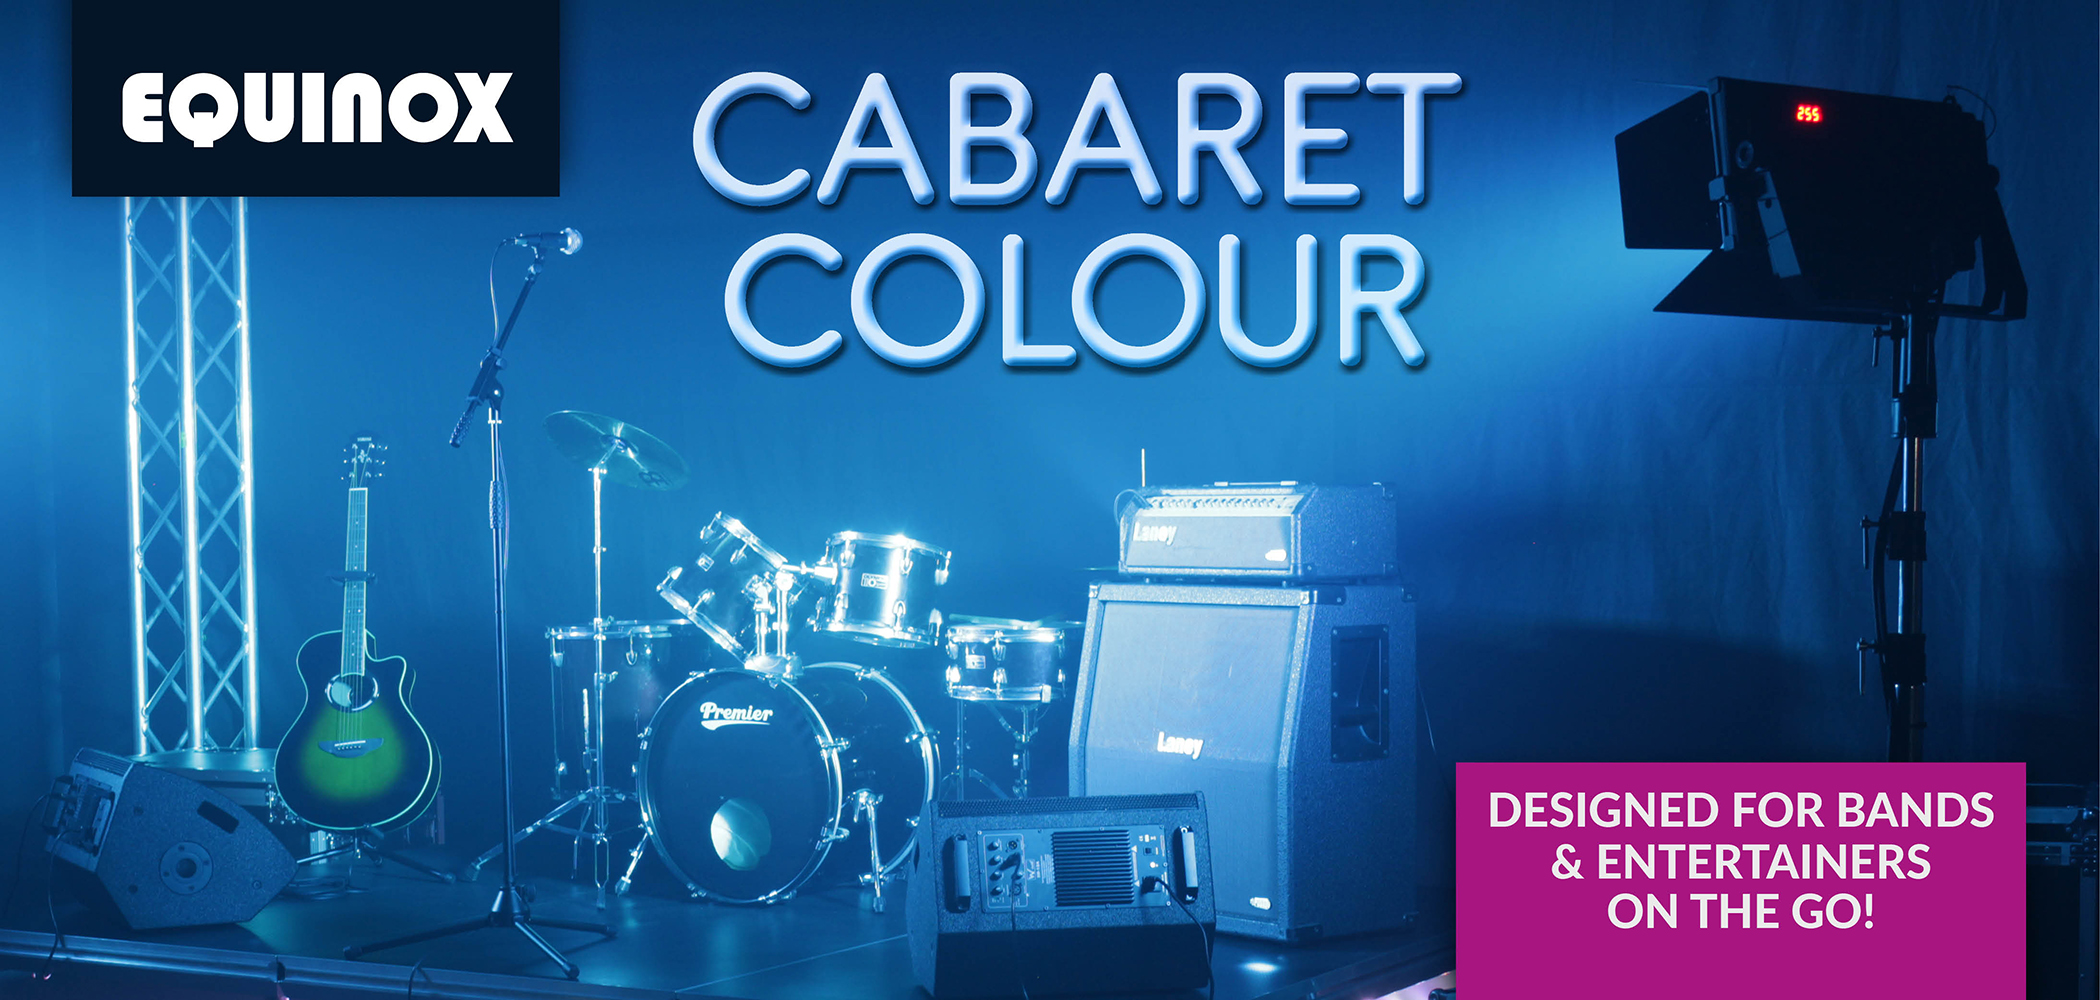 Cabaret Colour